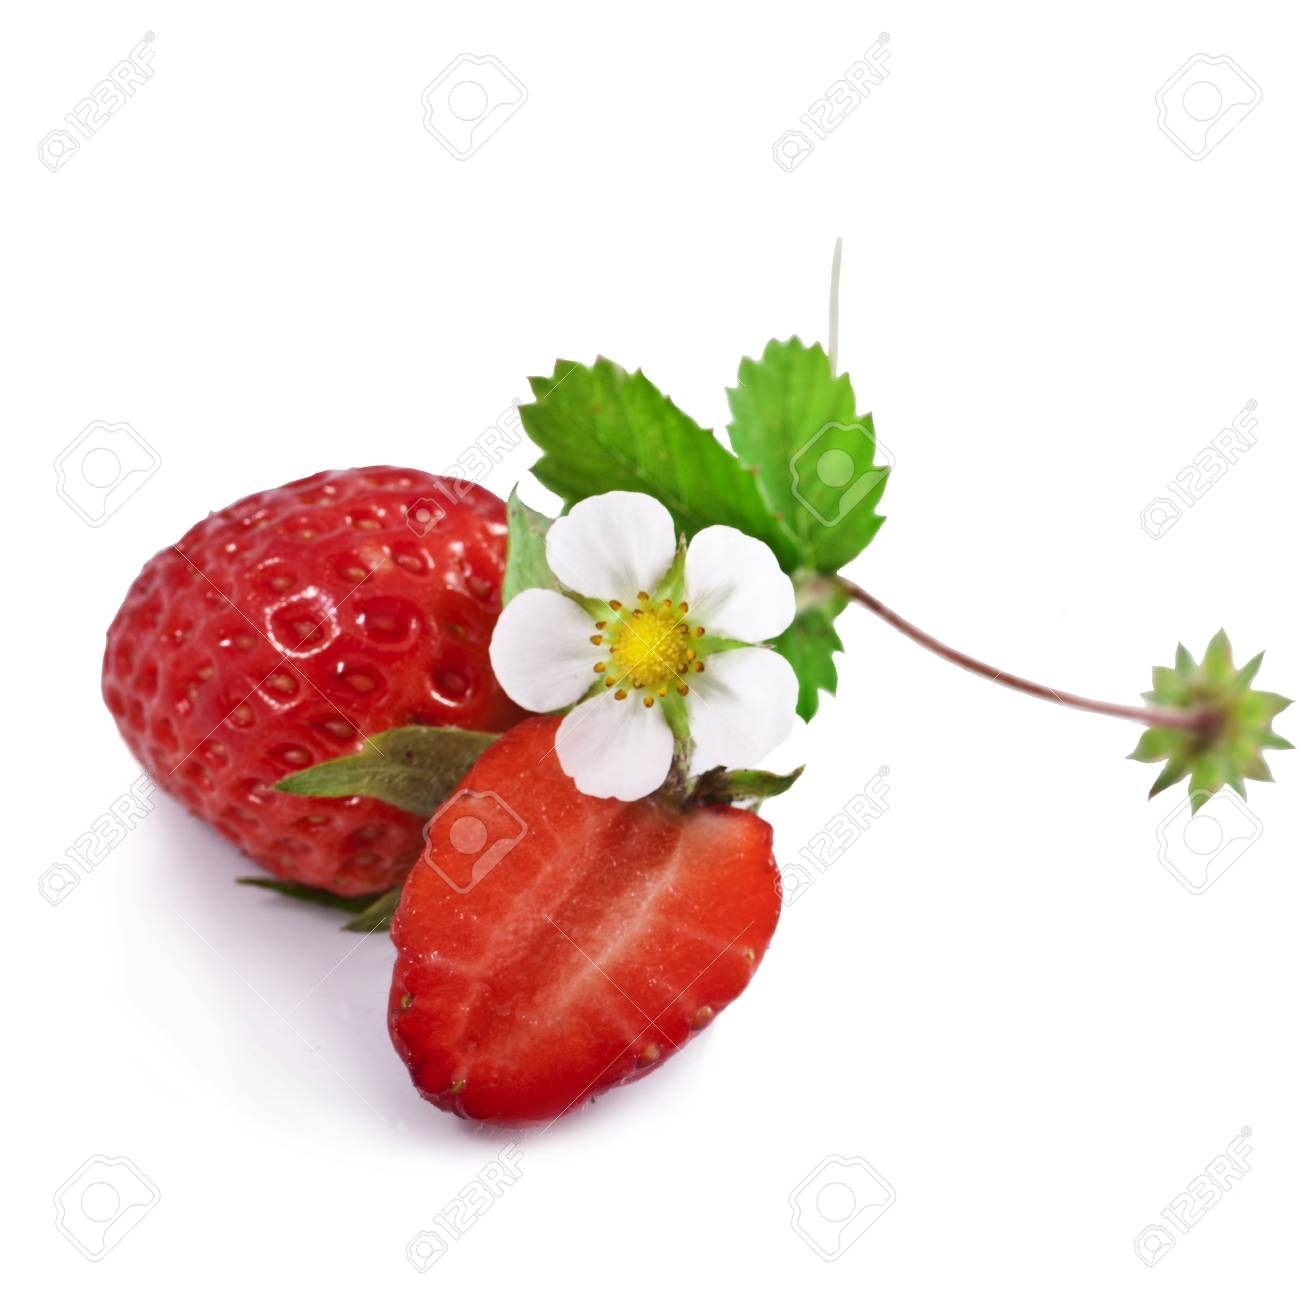 Appetizing strawberry  Isolated on a white background Stock Photo - 20853387